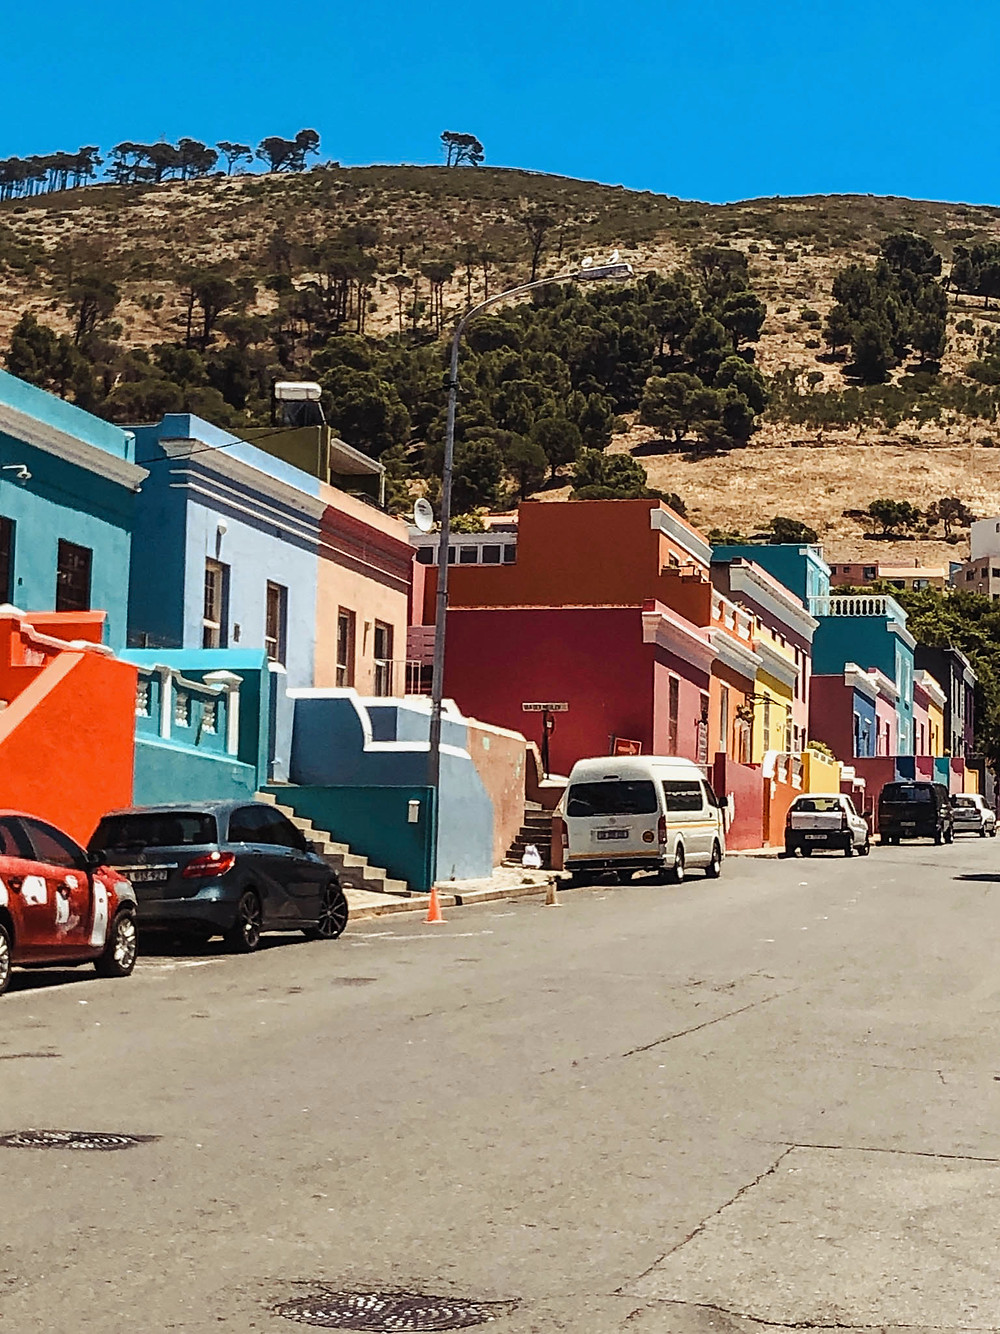 Looking up Bo-Kaap's main drag, Wale Street, lined with the neighborhood's iconic houses